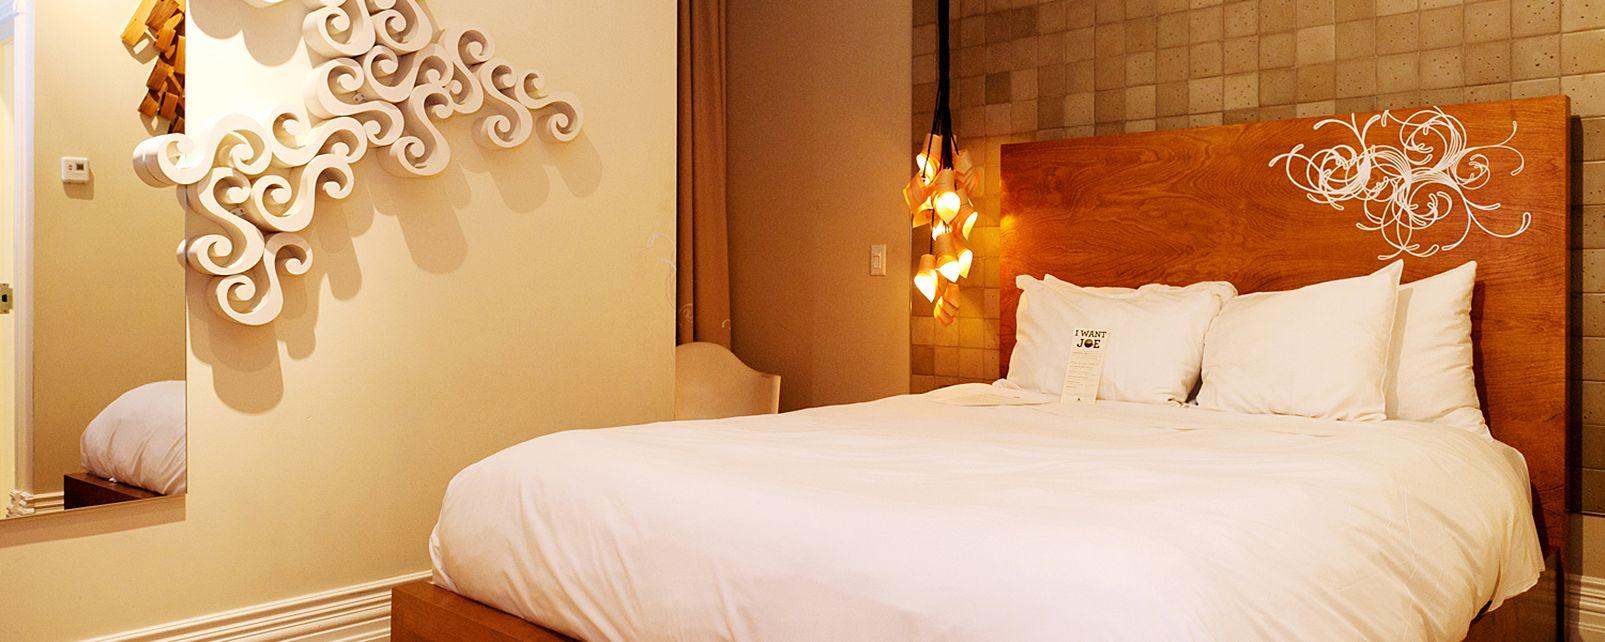 Hotel The Gladstone